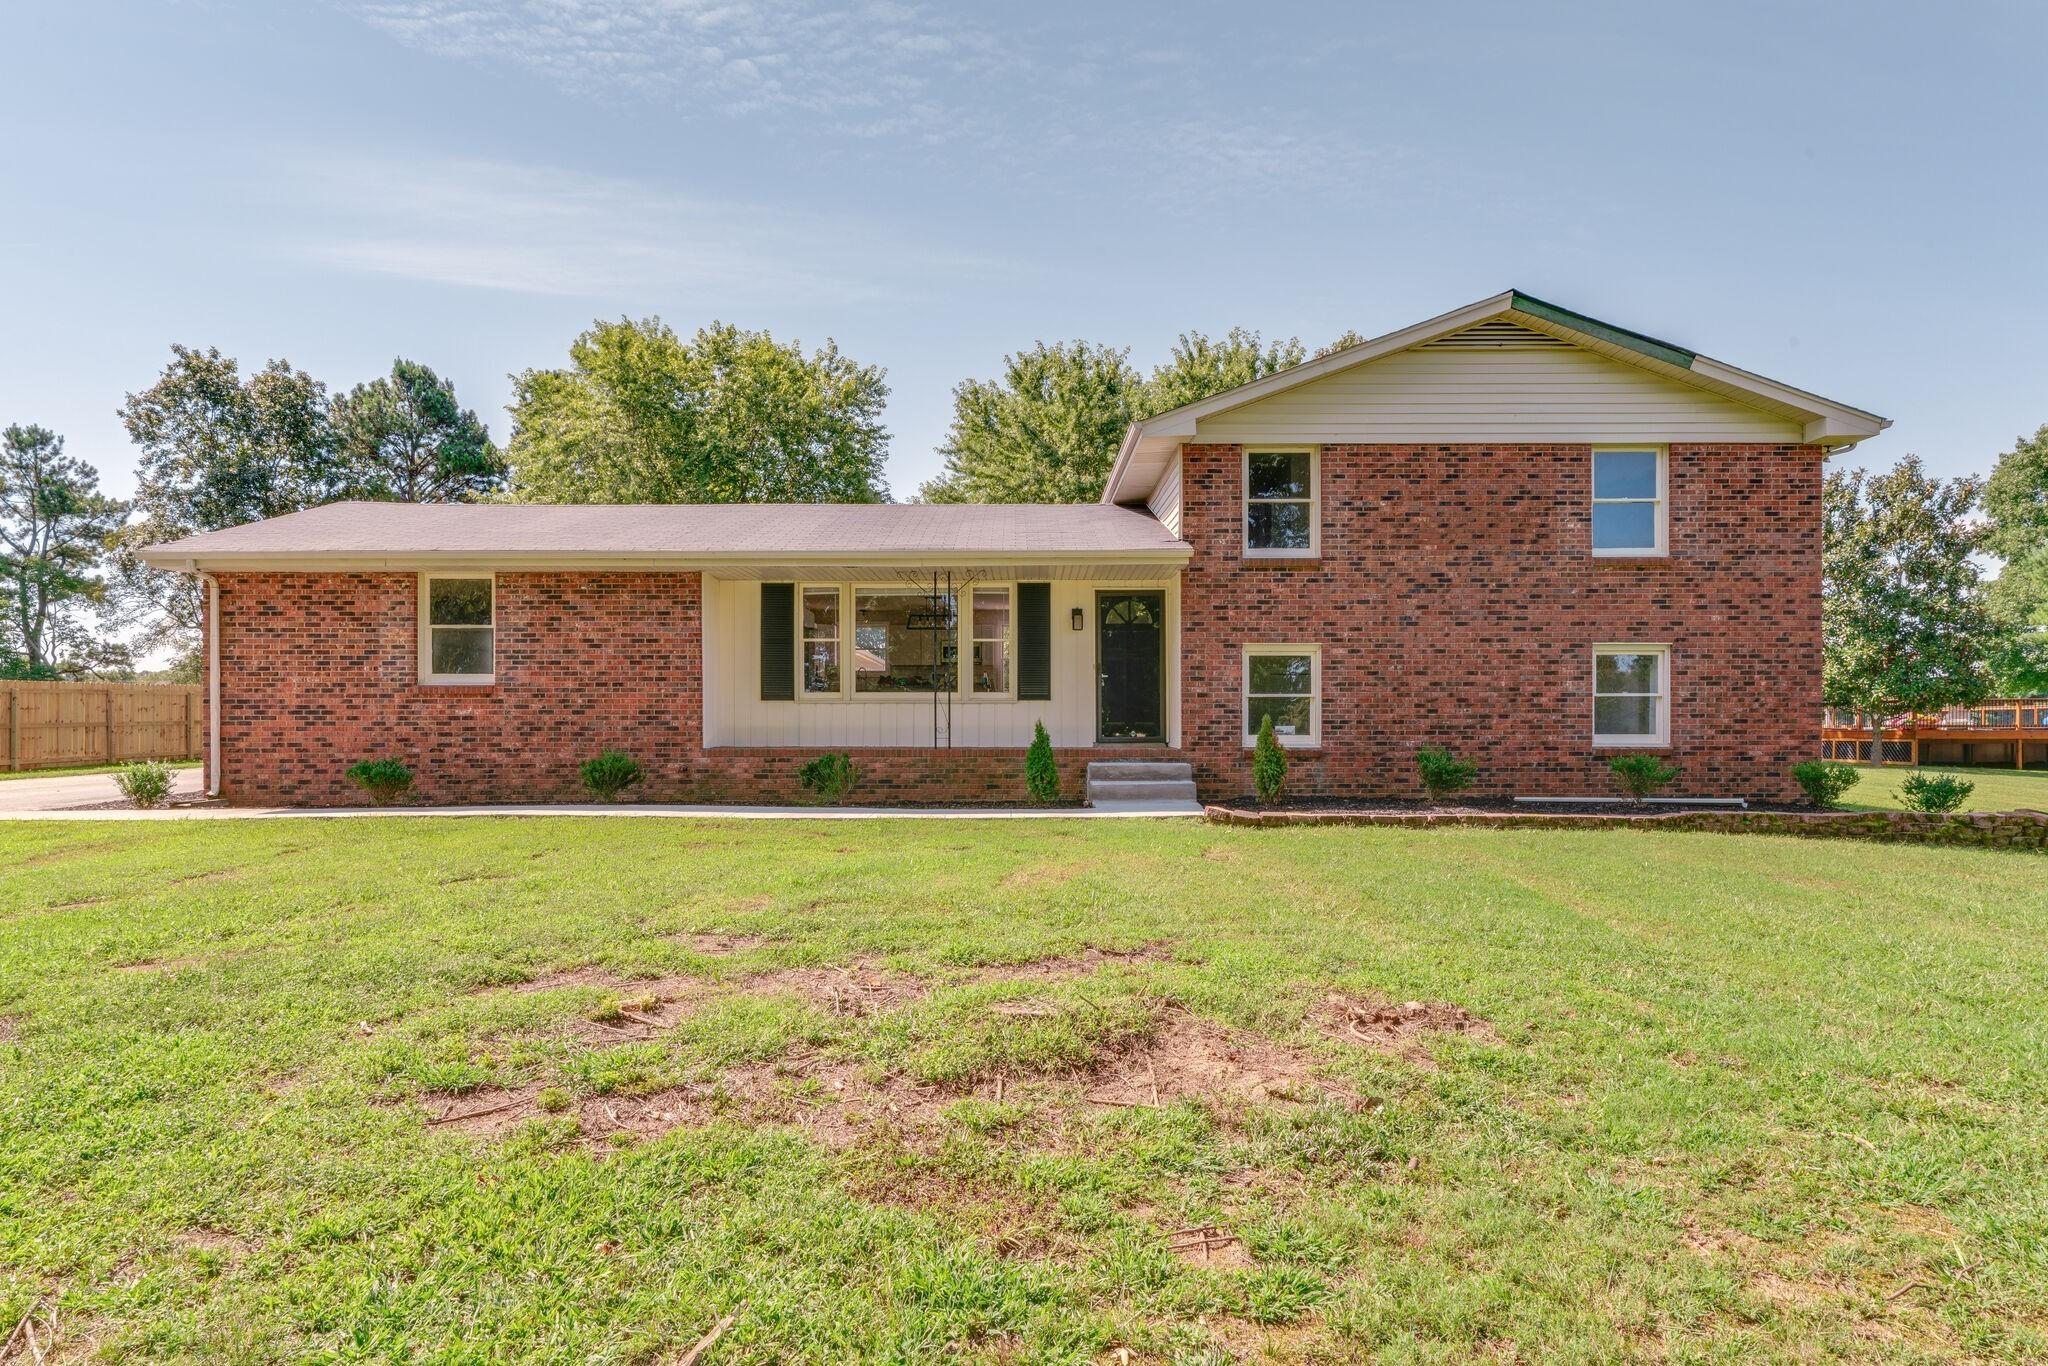 106 Briarwood Dr Property Photo - Greenbrier, TN real estate listing